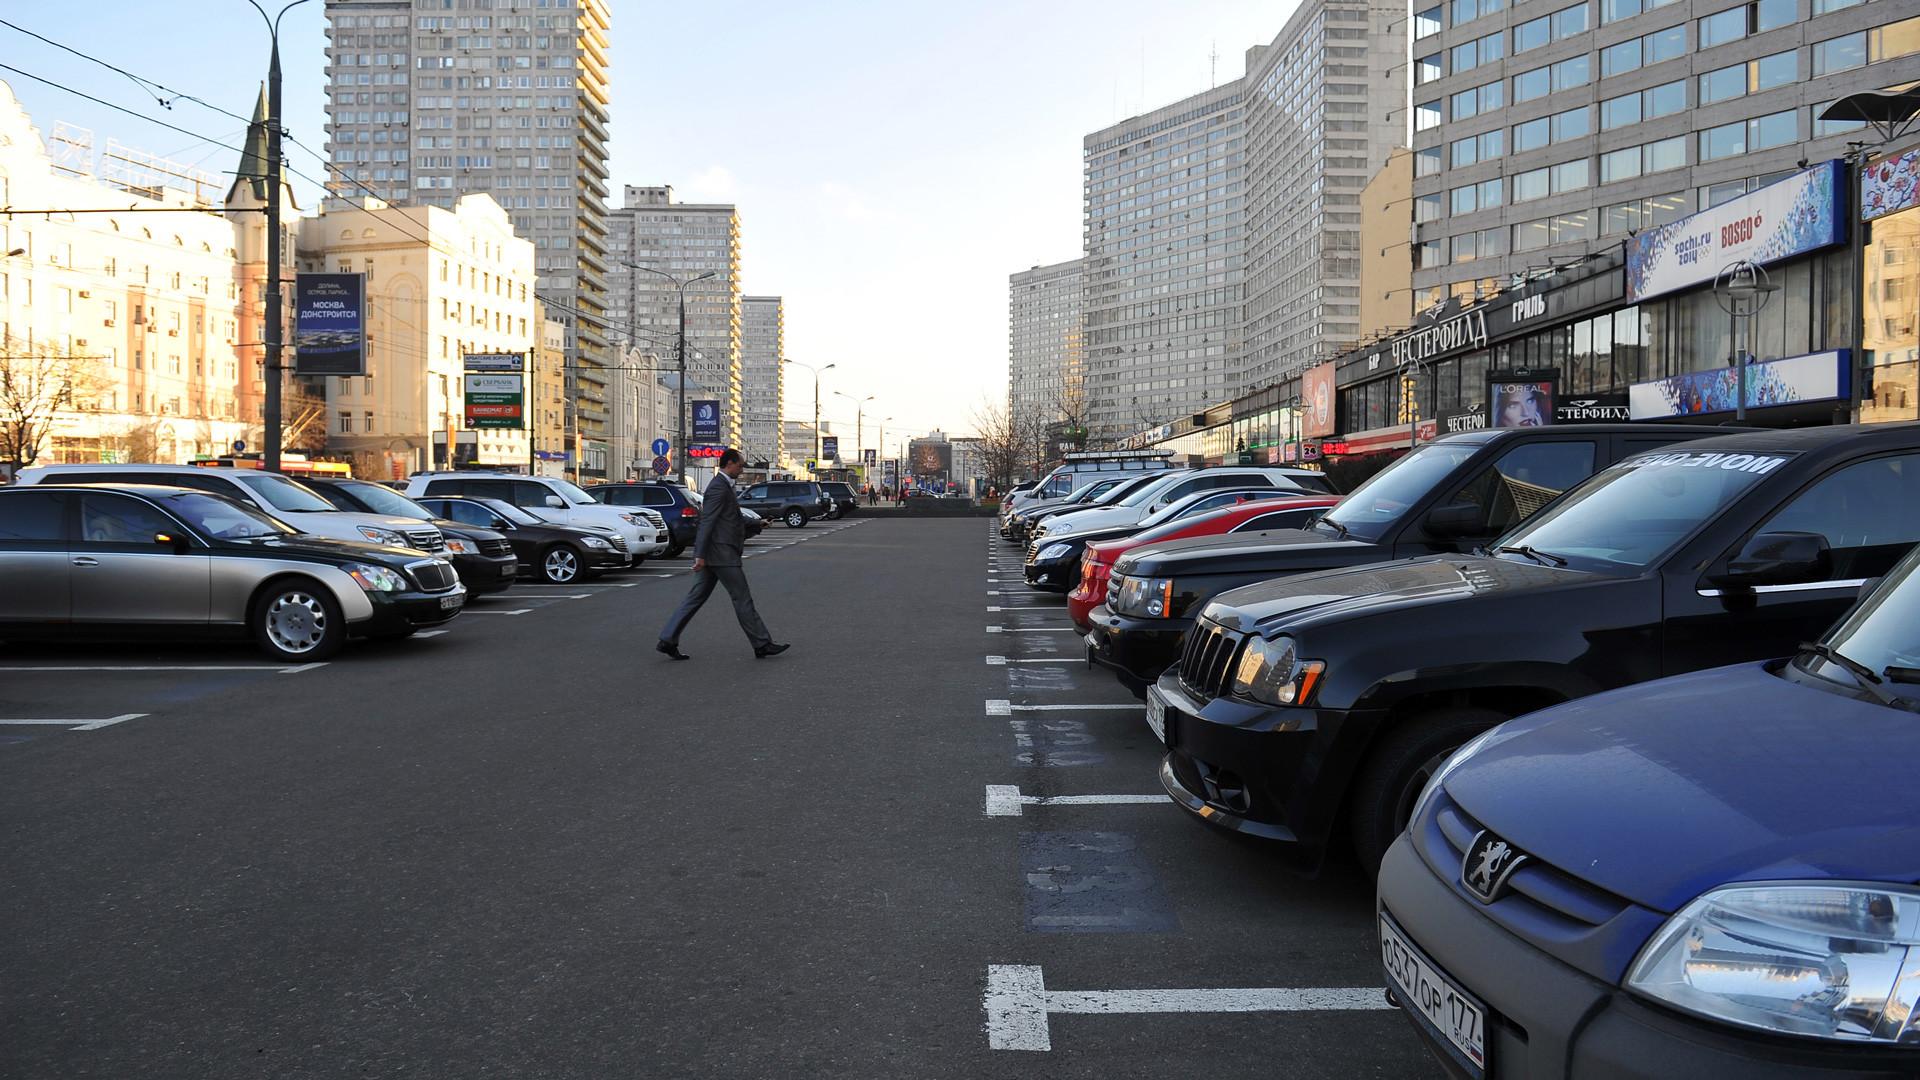 Фото: ©РИА Новости/Владимир Песня